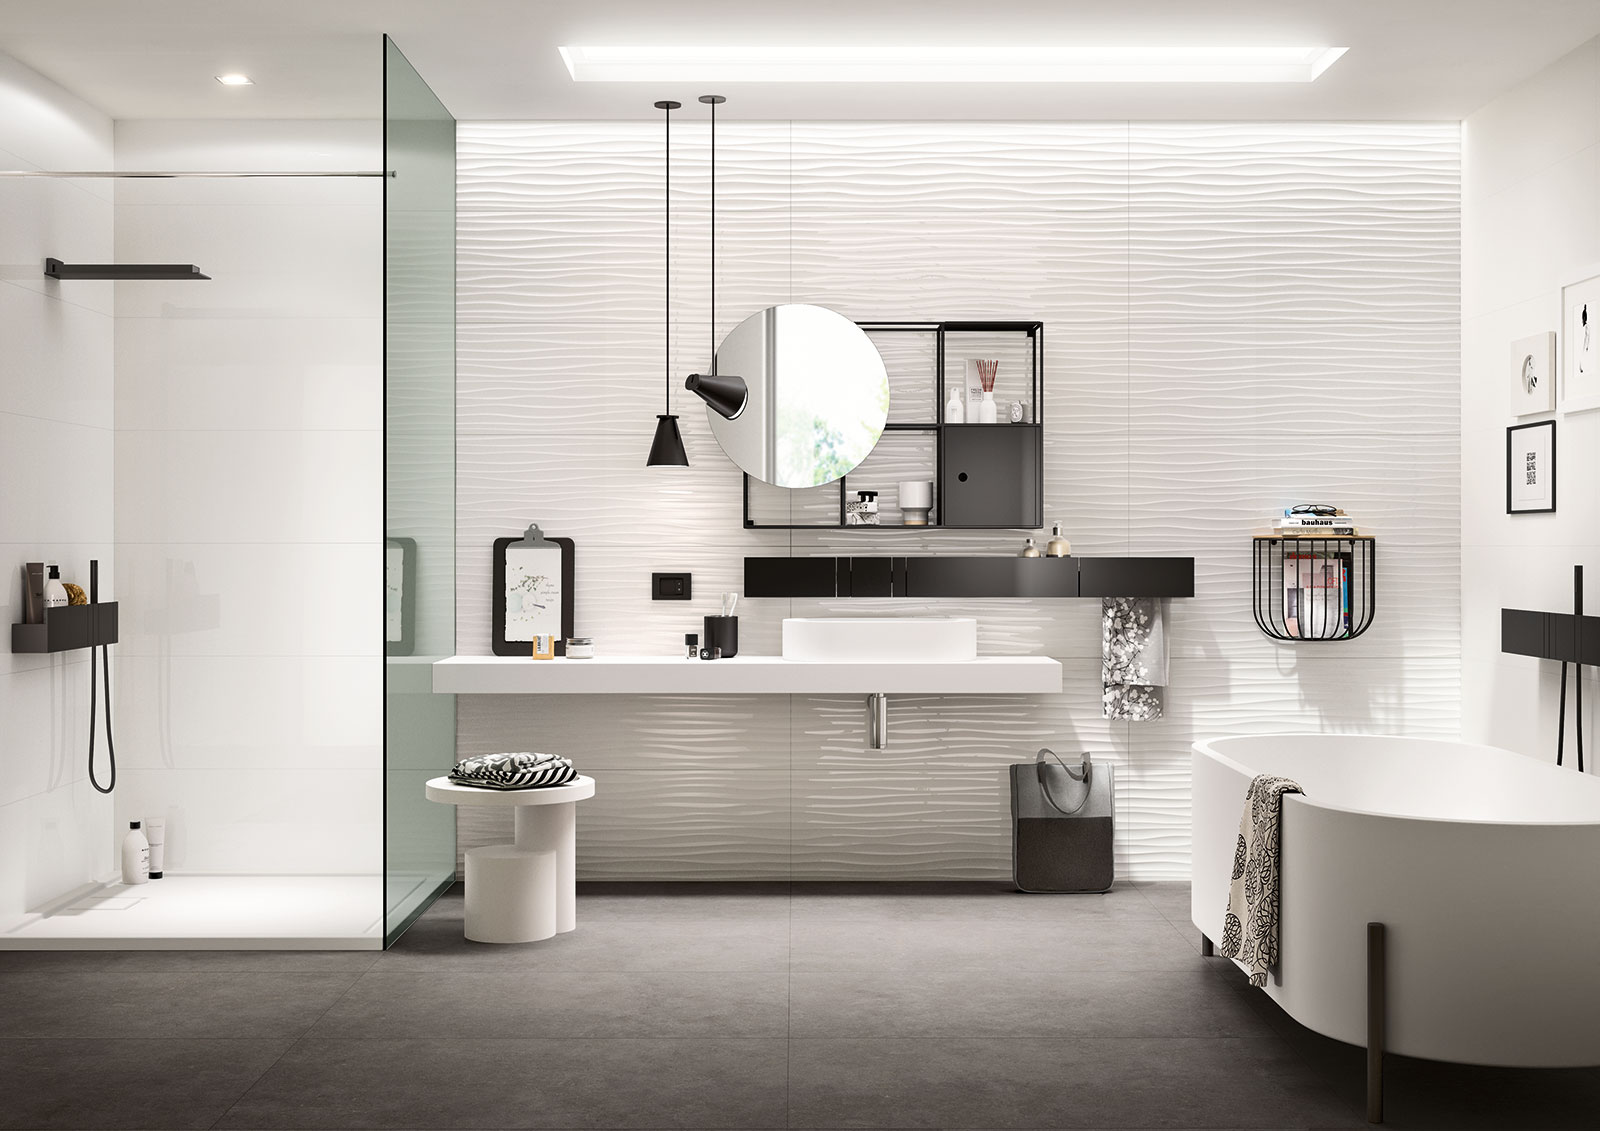 Essenziale ceramica bianca per bagni marazzi - Marazzi piastrelle bagno ...